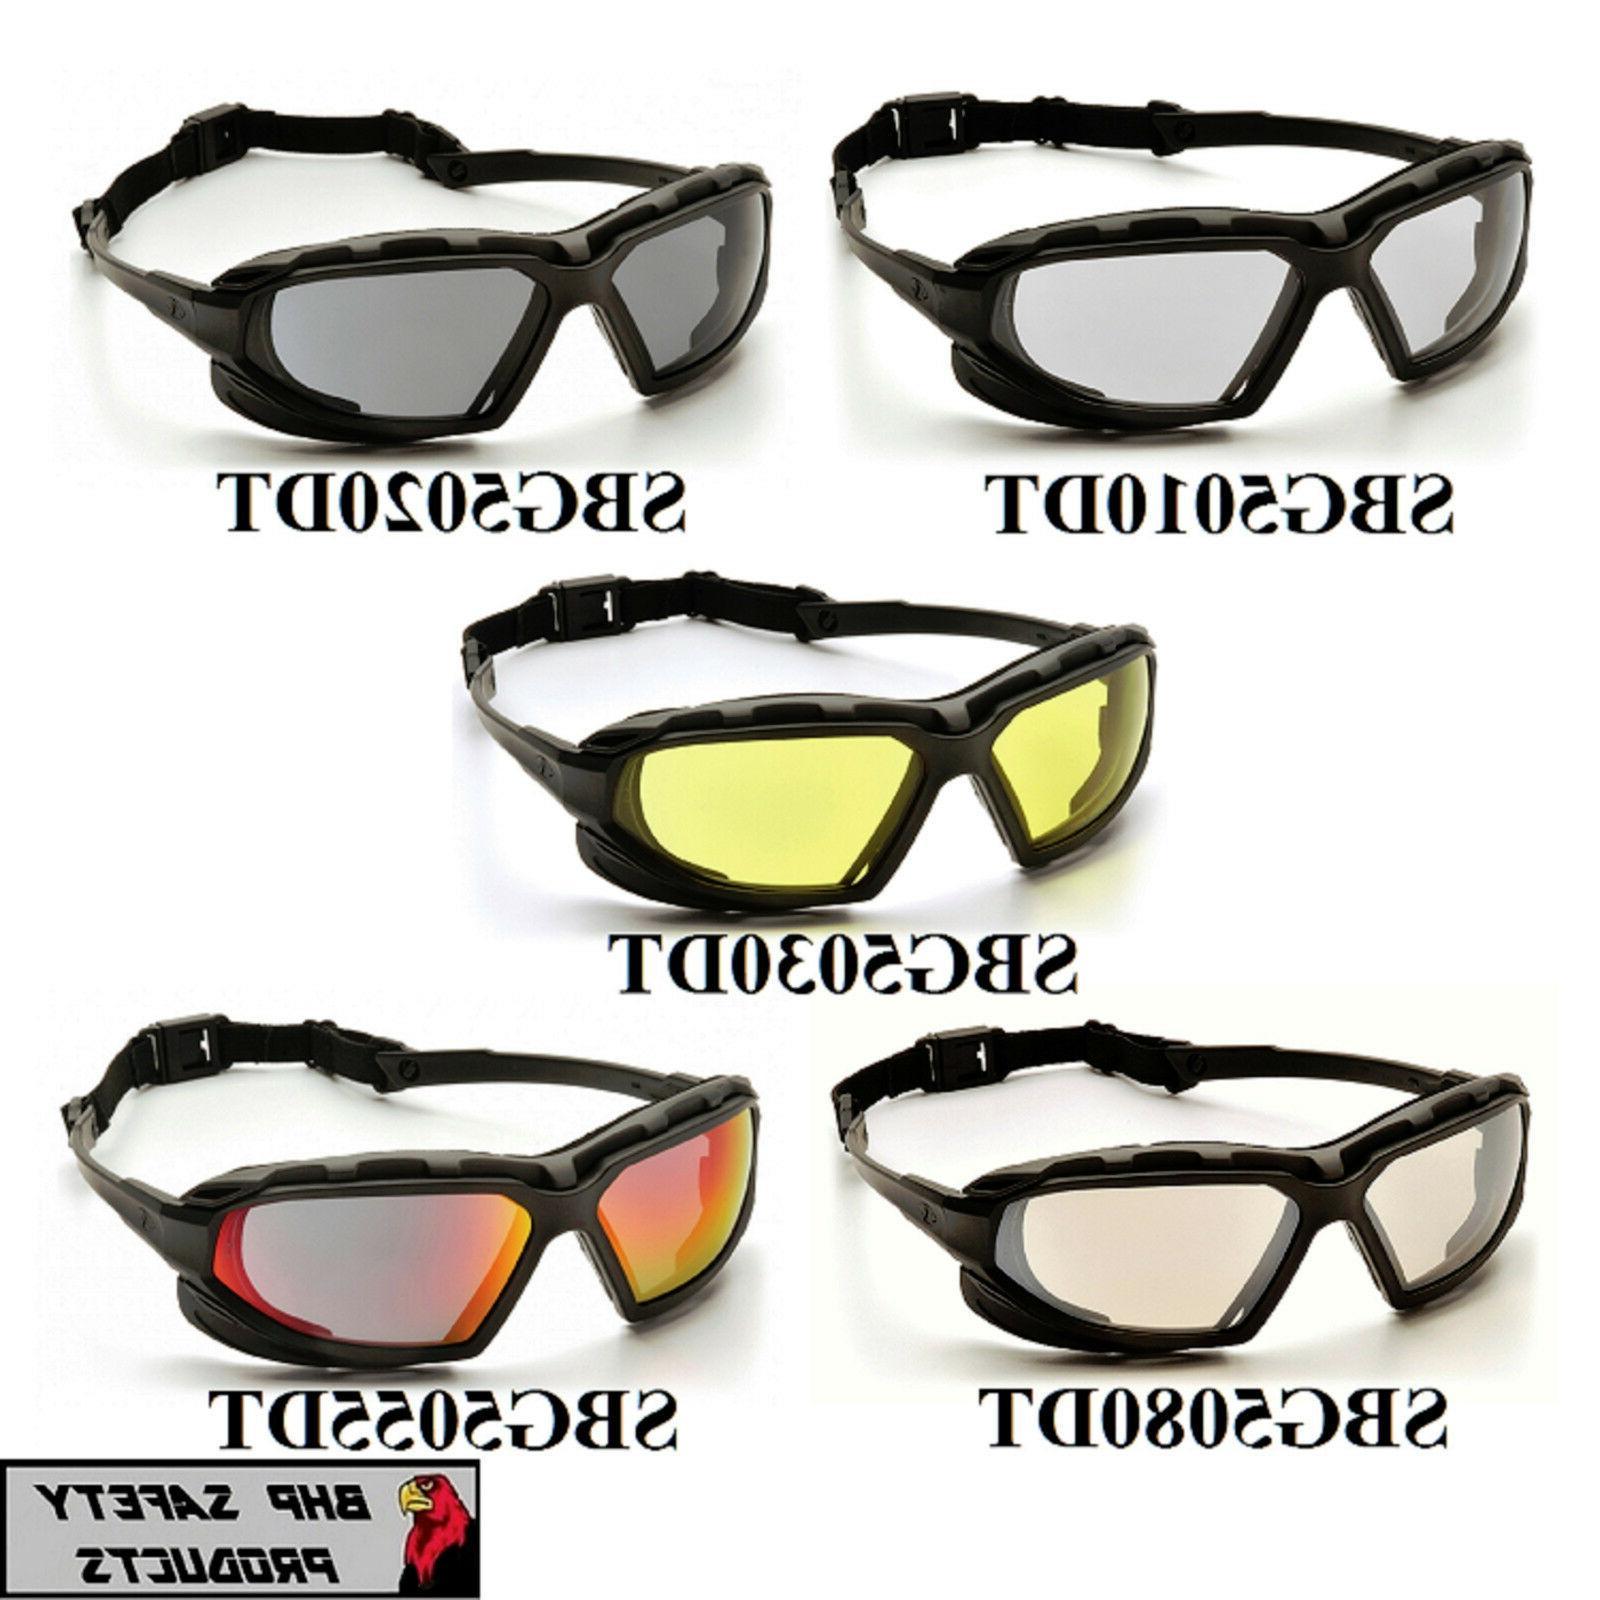 highlander plus safety glasses construction work sunglasses